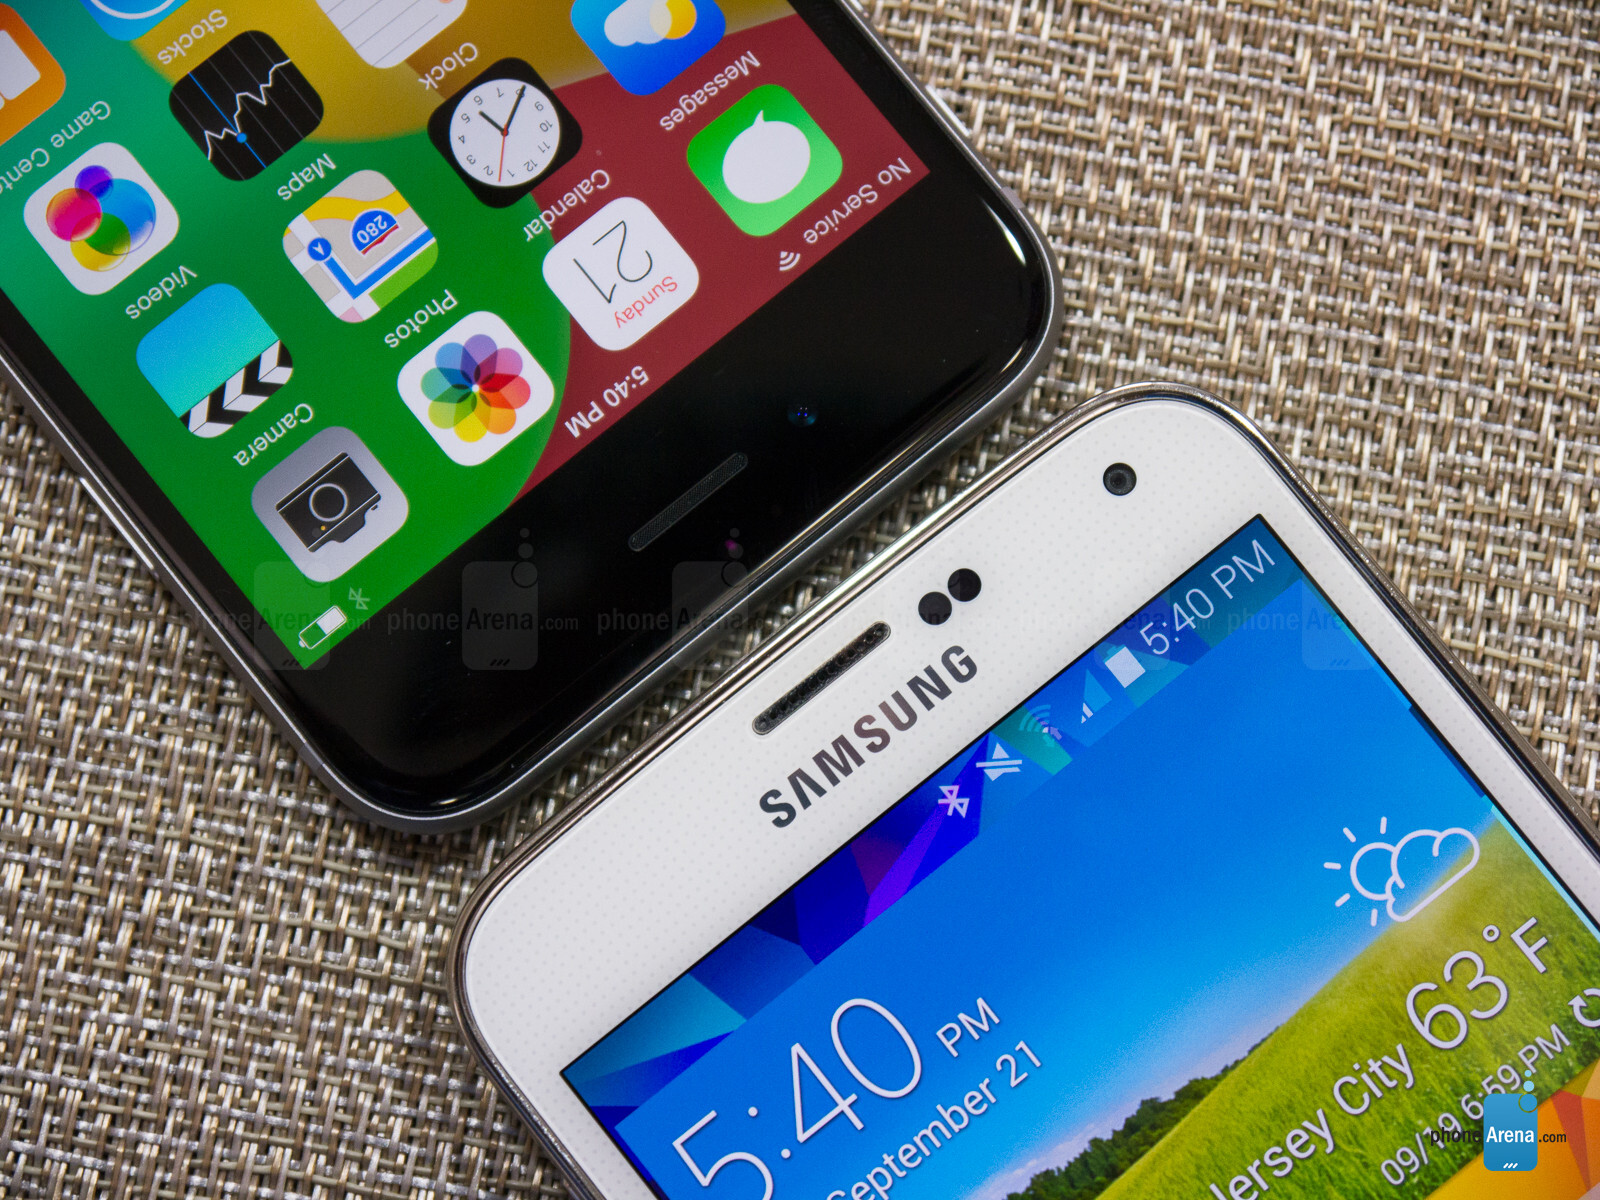 samsung knox vs iphone